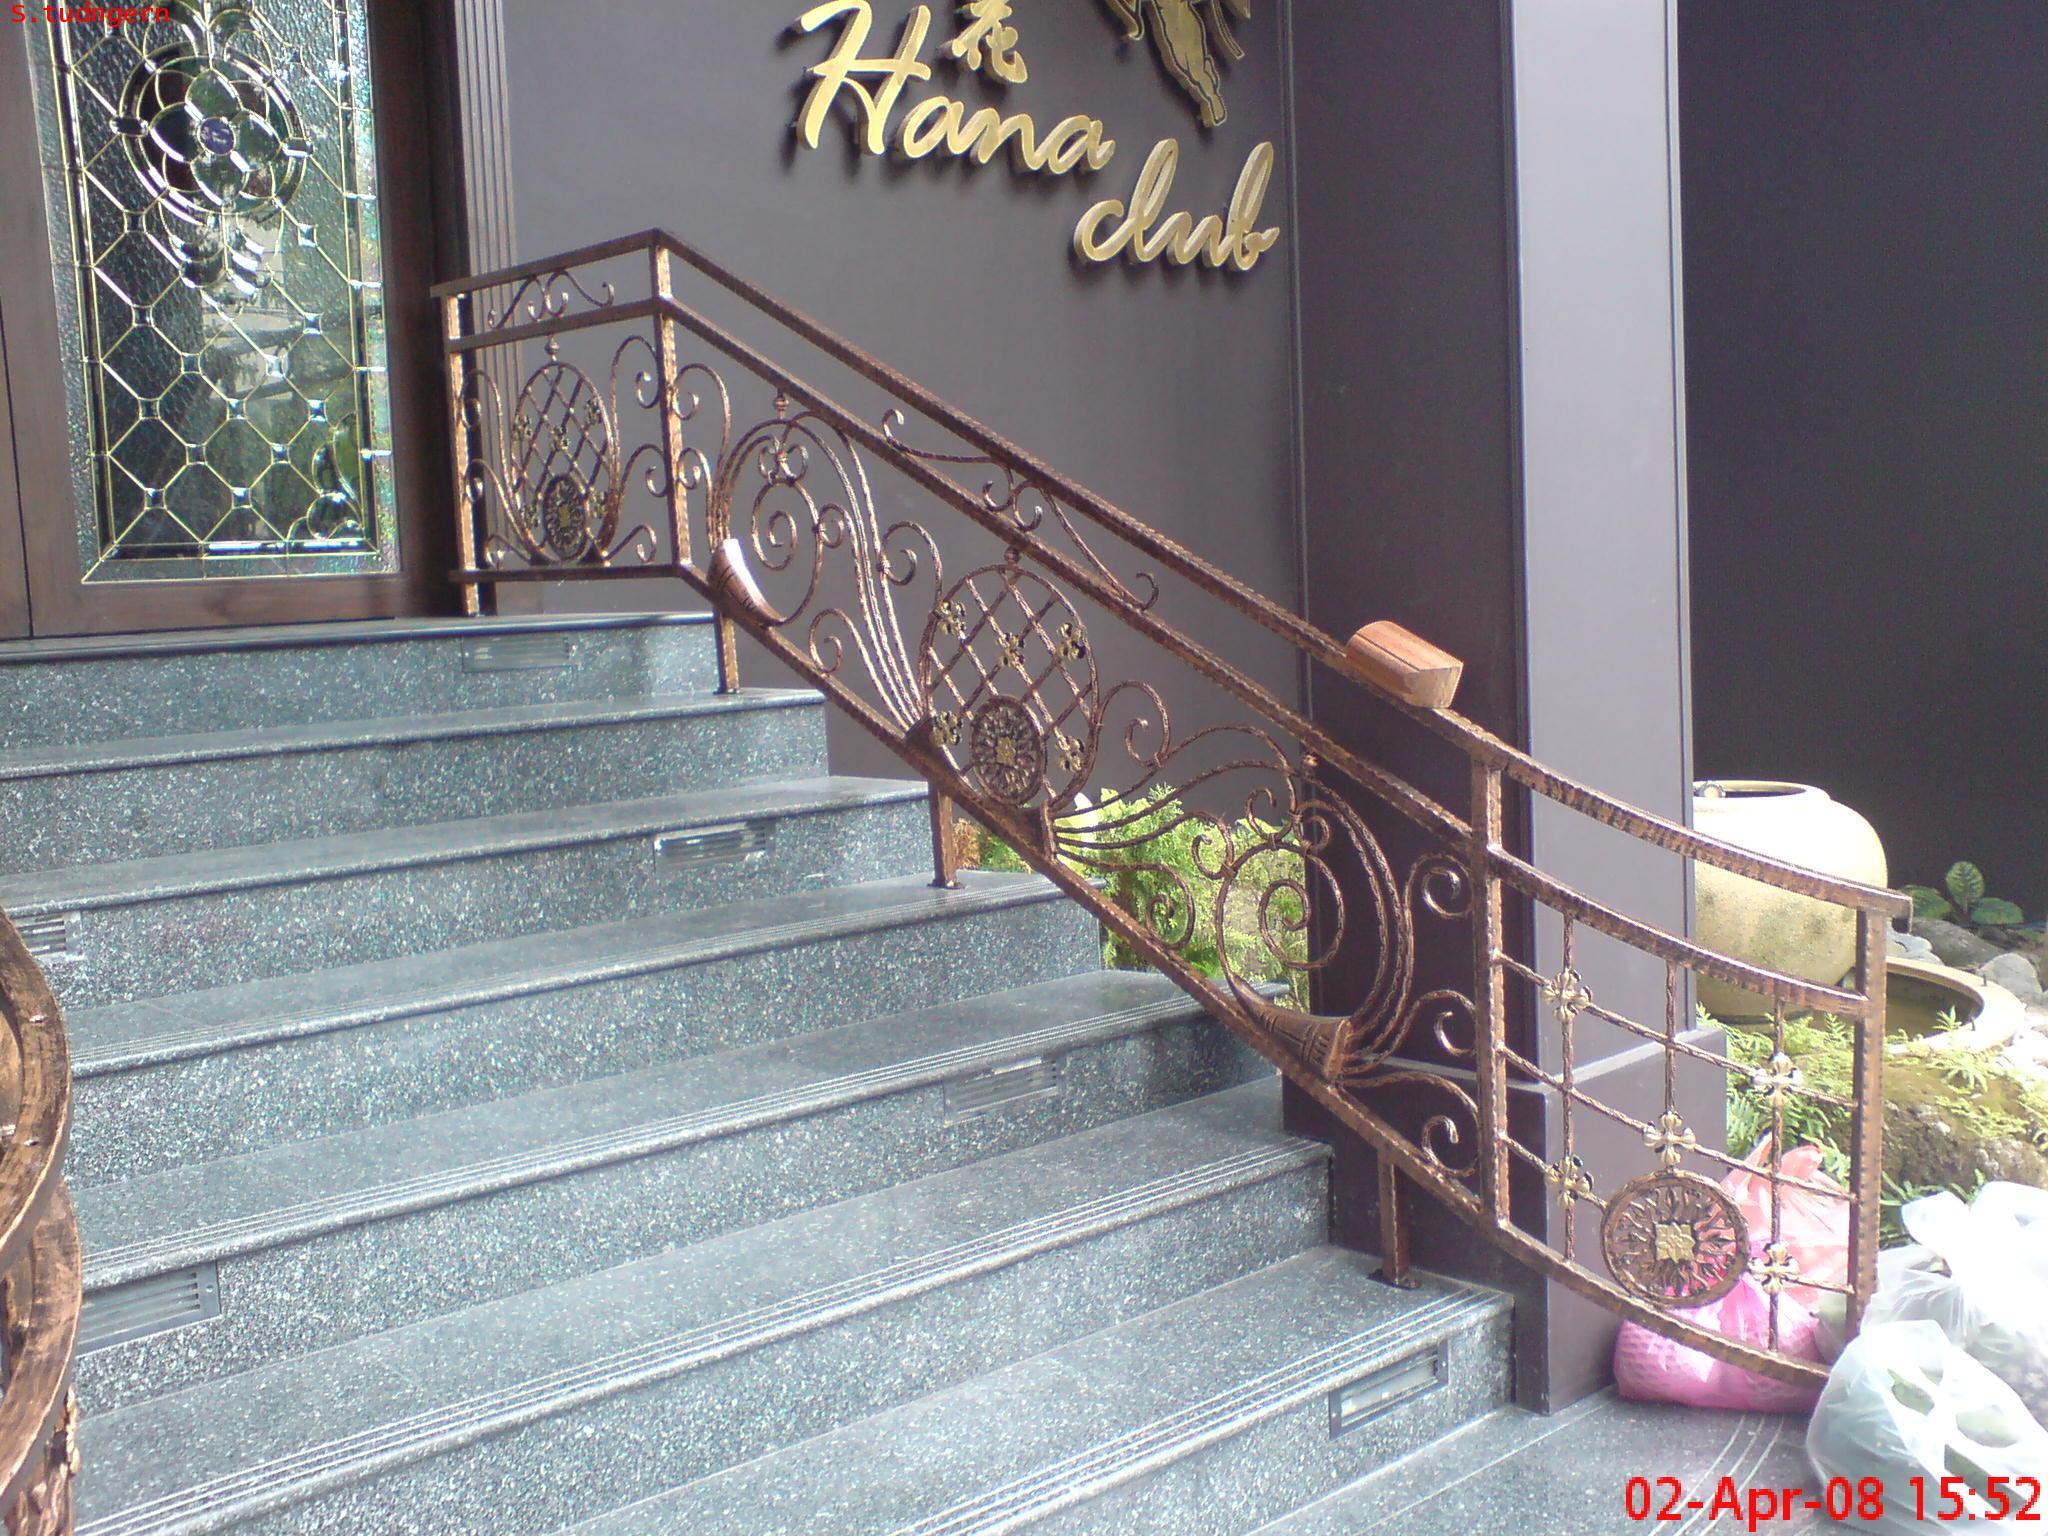 DIY ราวกันตกเหล็กดัดอิตาลี/ร้อทไอร์อ้อน Wrought Iron Steel Banister@Hanako Restaurant Thonglor17 Rd.